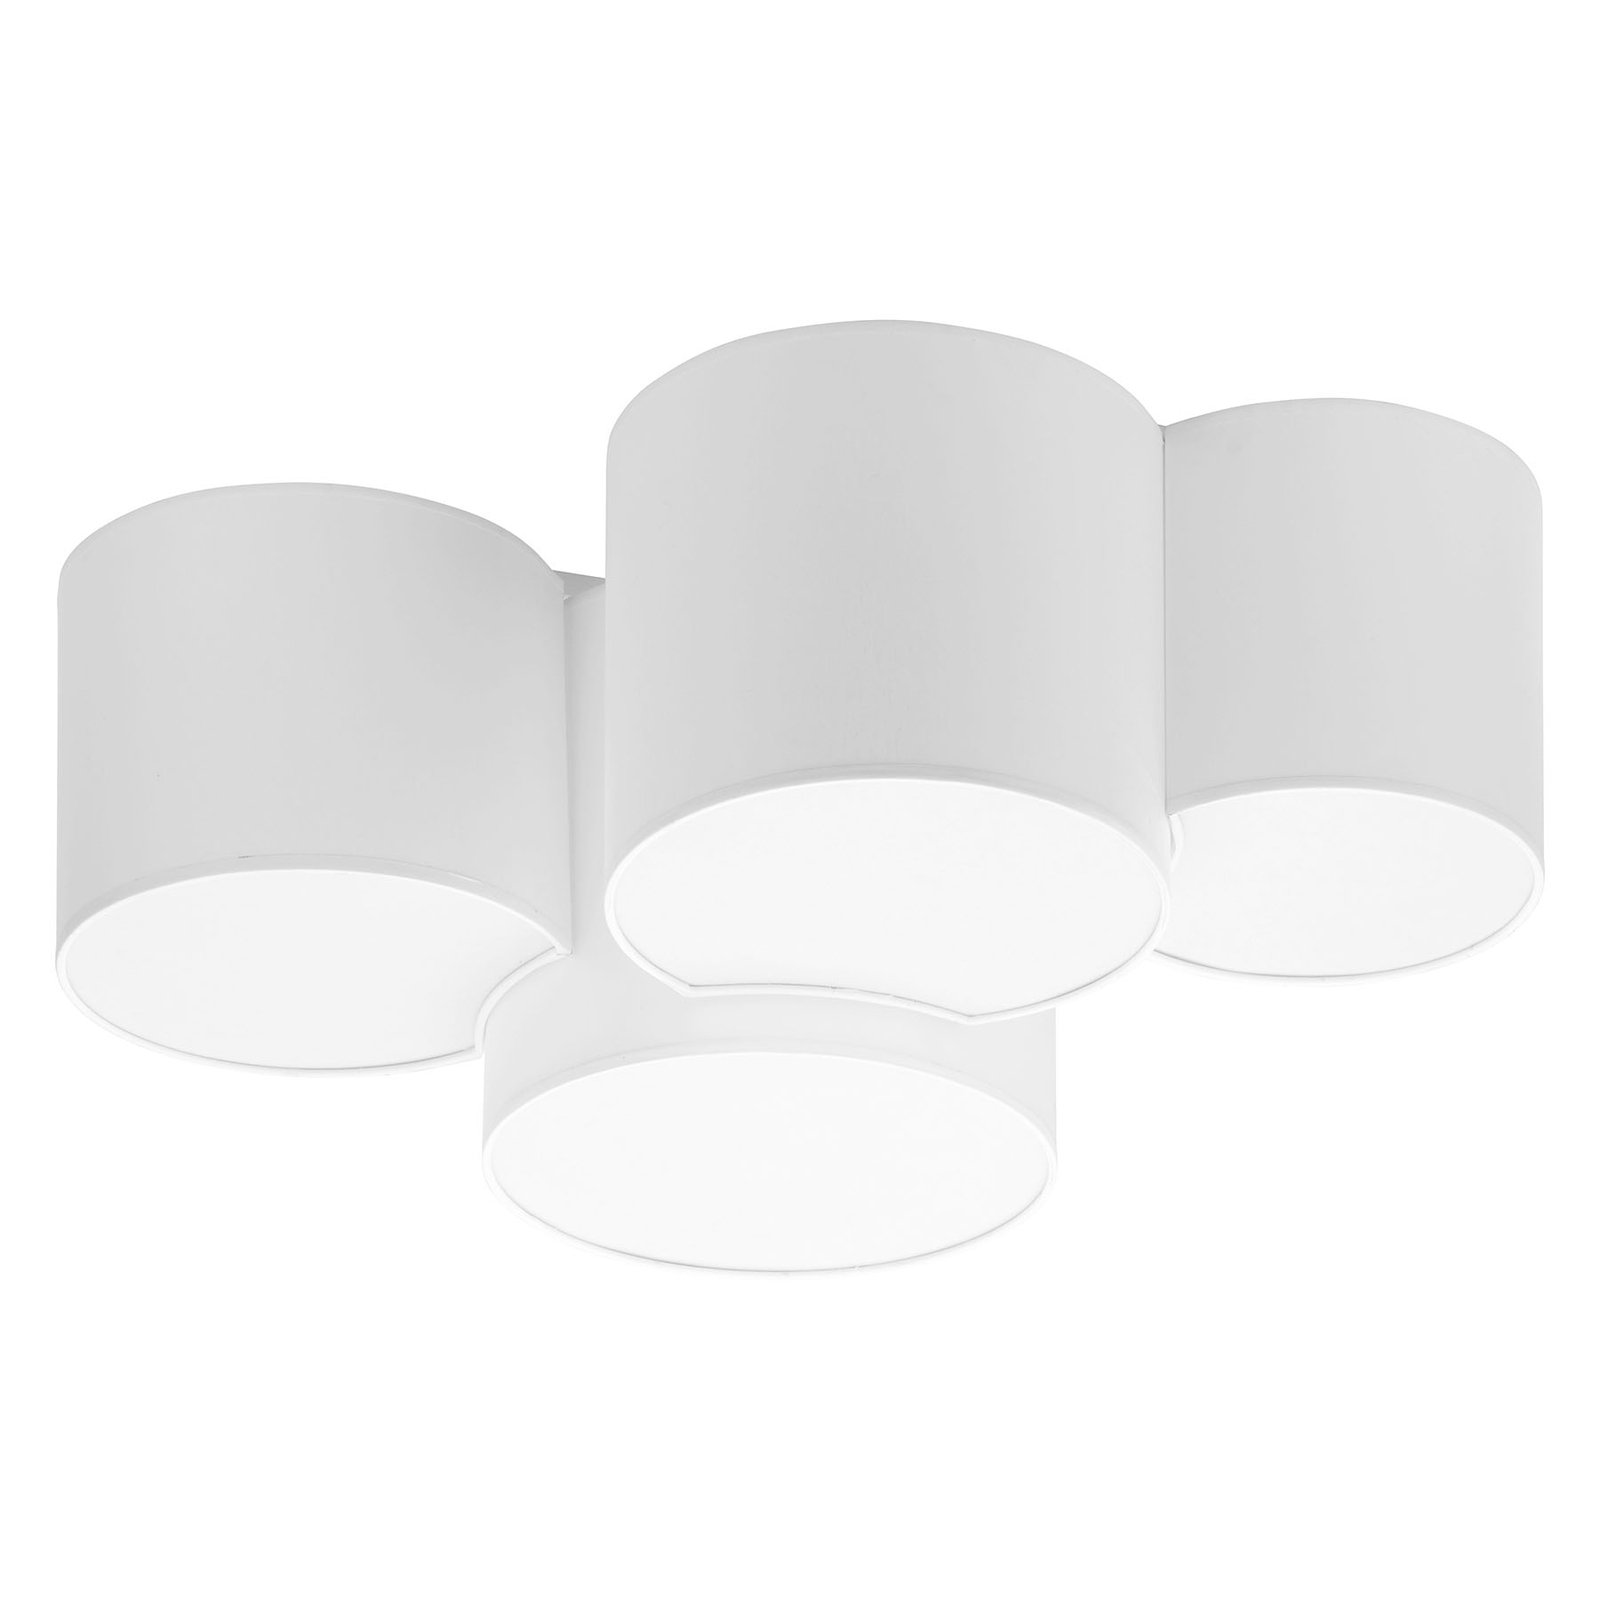 Taklampe Mona fire lyskilder, hvit